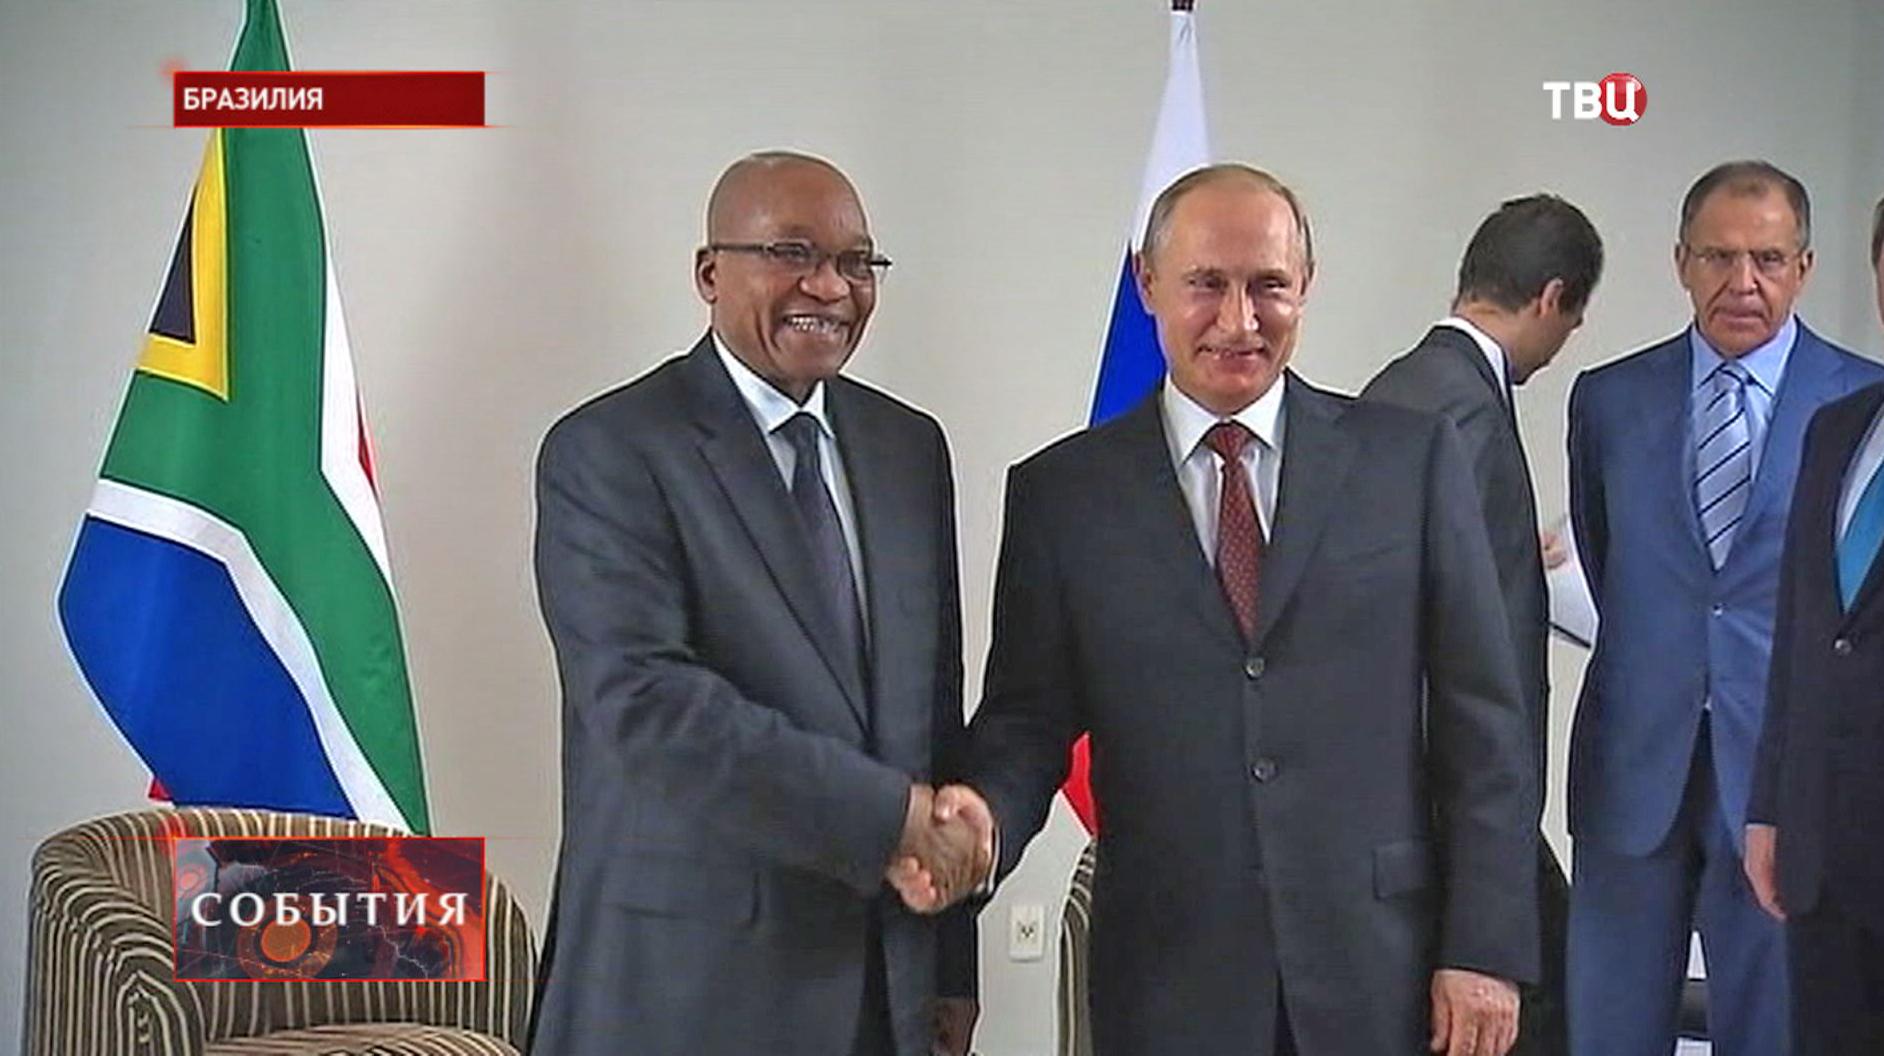 Владимир Путин и президент ЮАР Джейкоб Зума